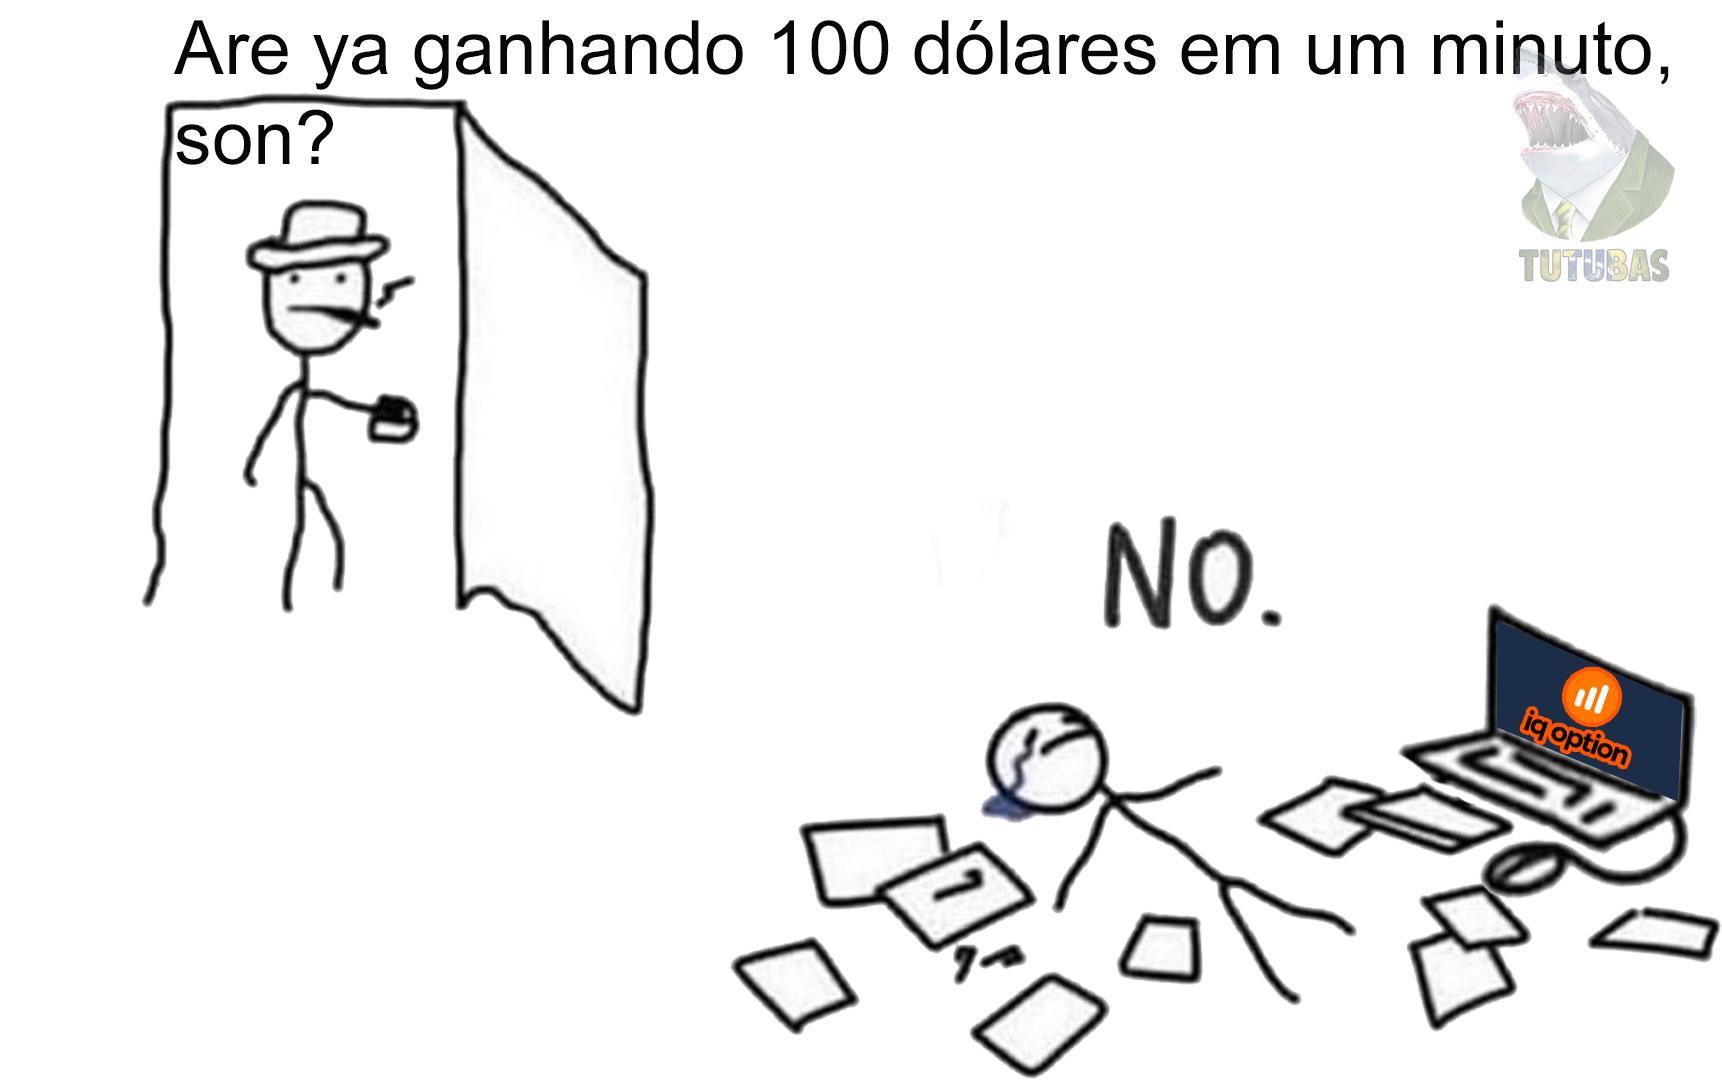 Are ya me mamando, user comum? - meme